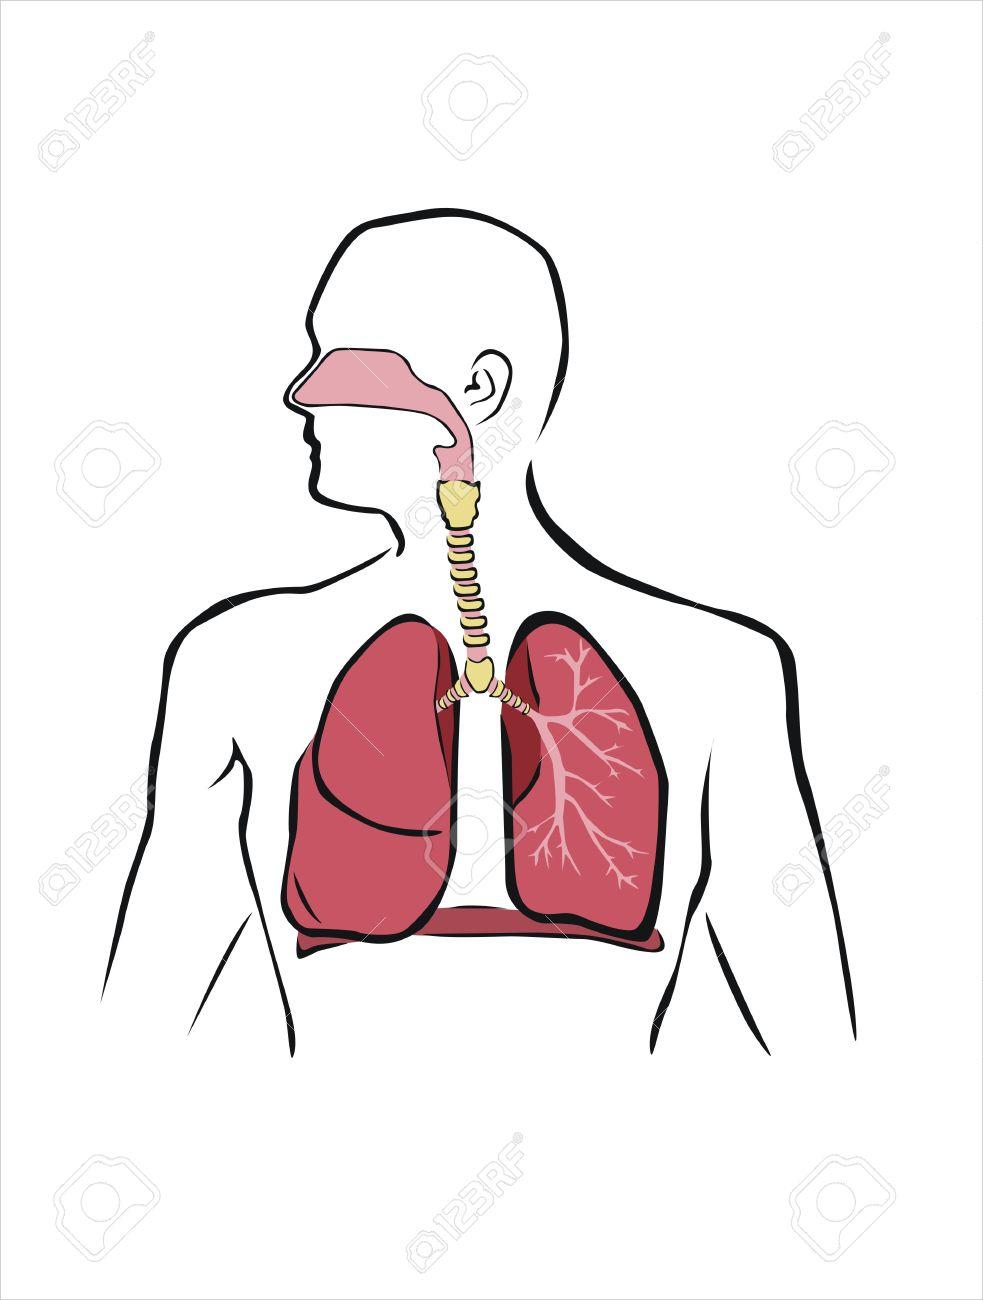 Vector - diagram of human respiratory system